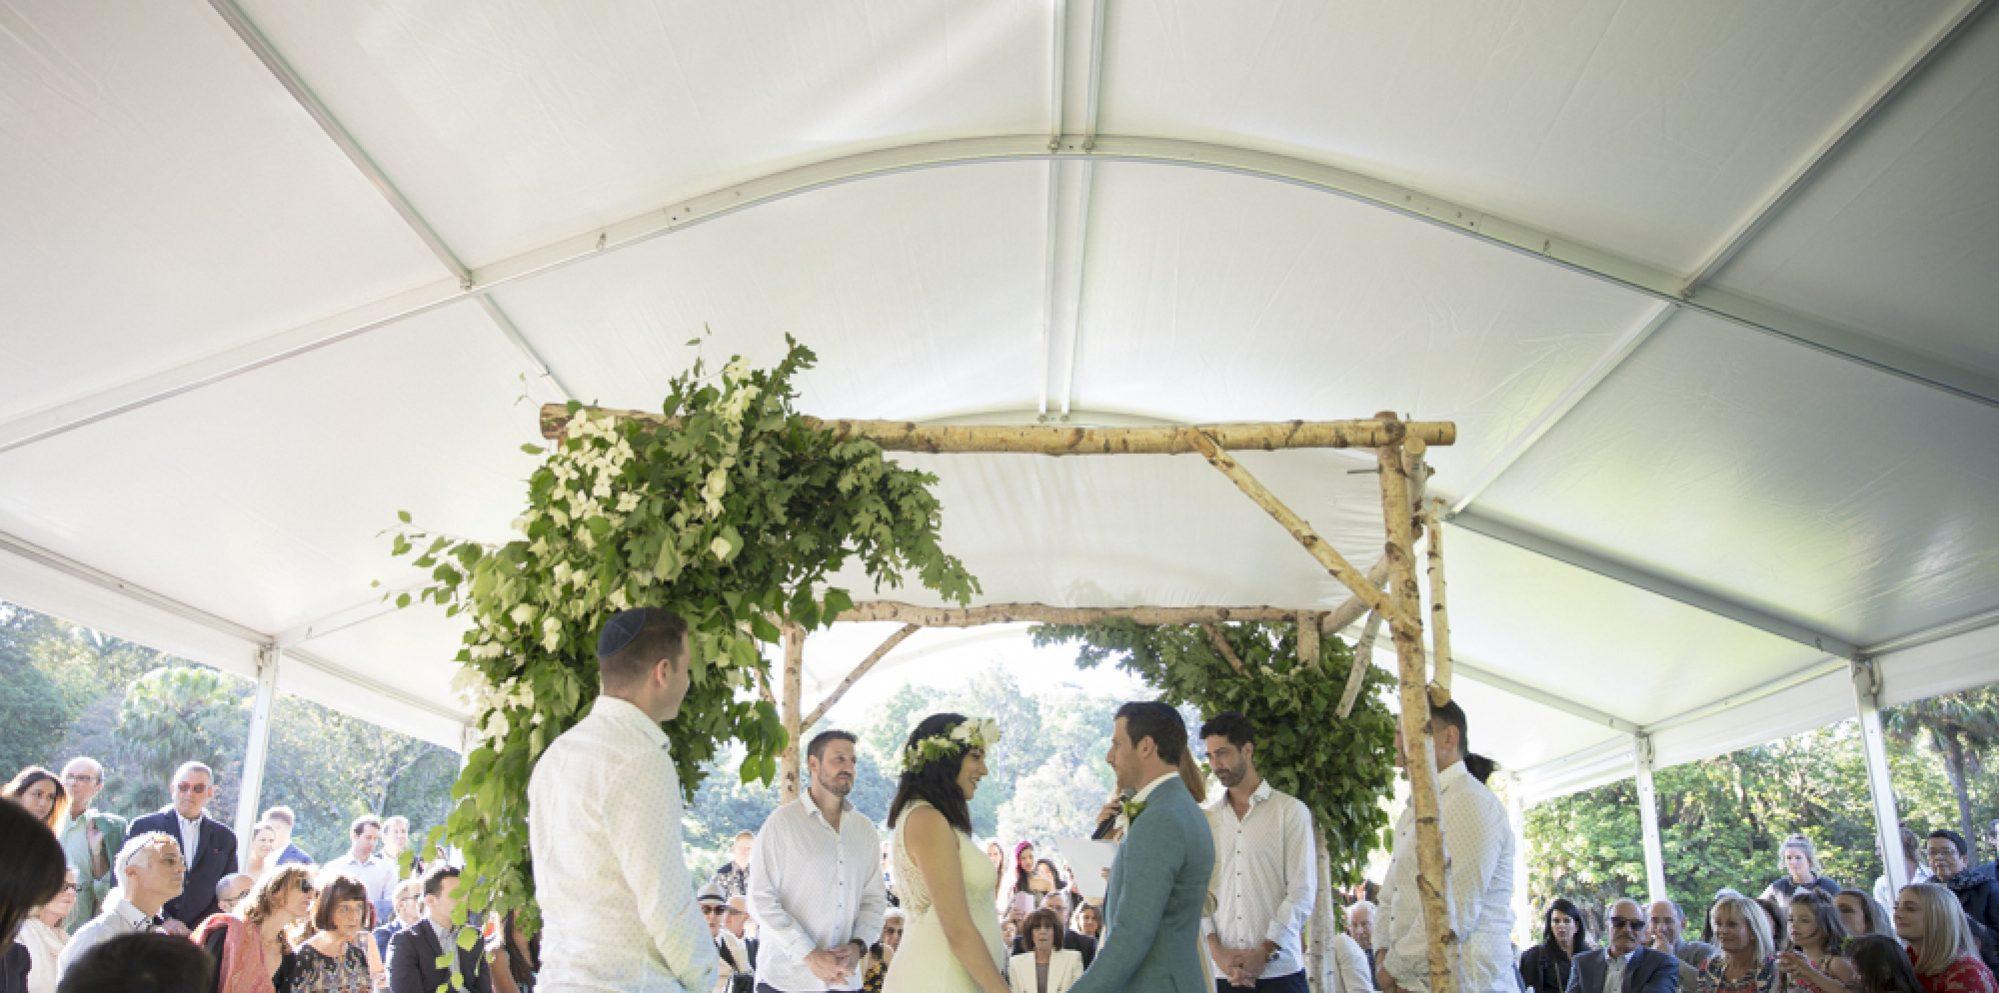 Paula & ben | the terrace – royal botanic gardens wedding videography melbourne